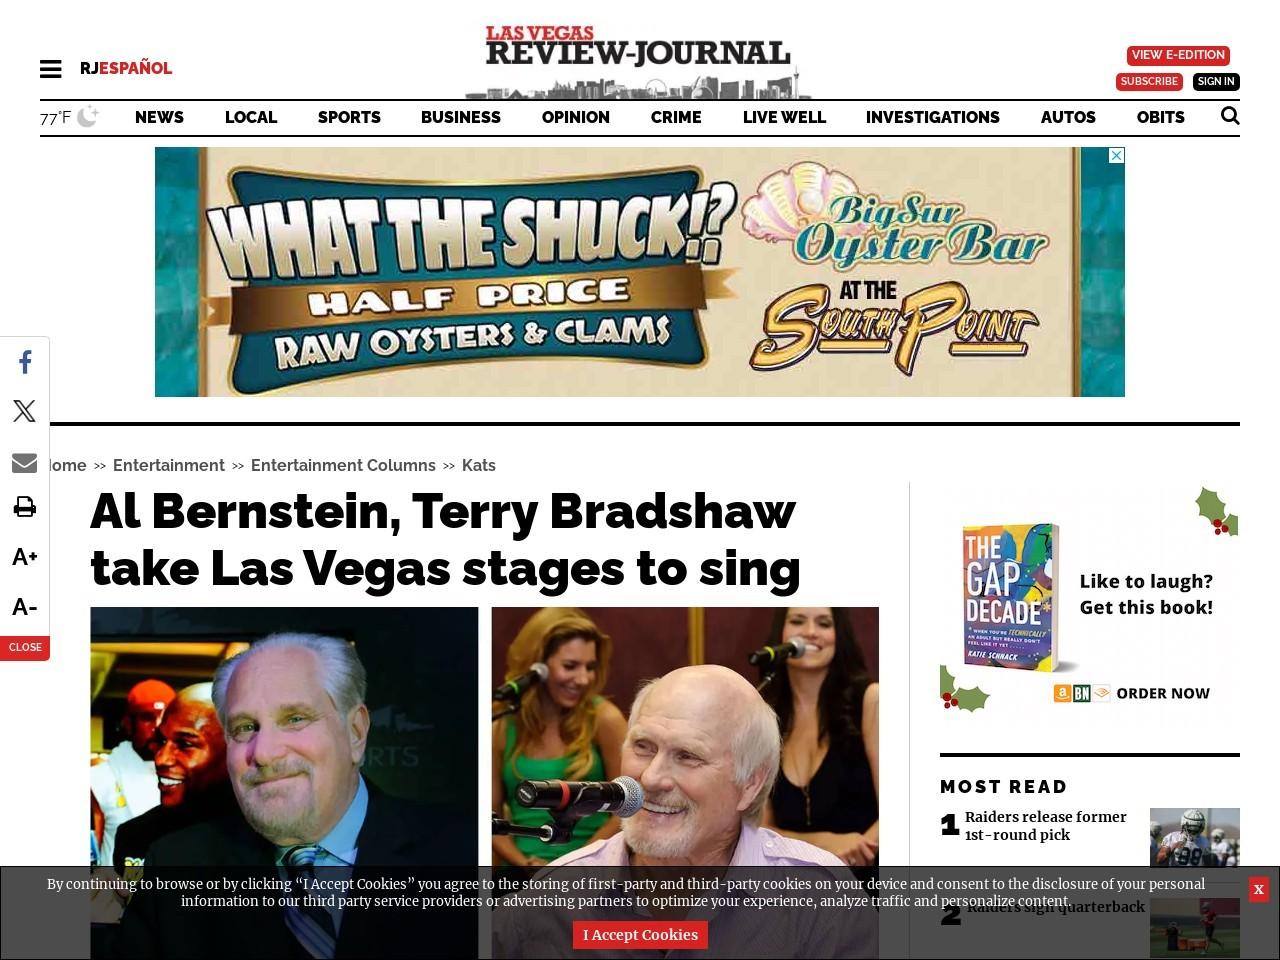 Al Bernstein, Terry Bradshaw take Las Vegas stages to sing